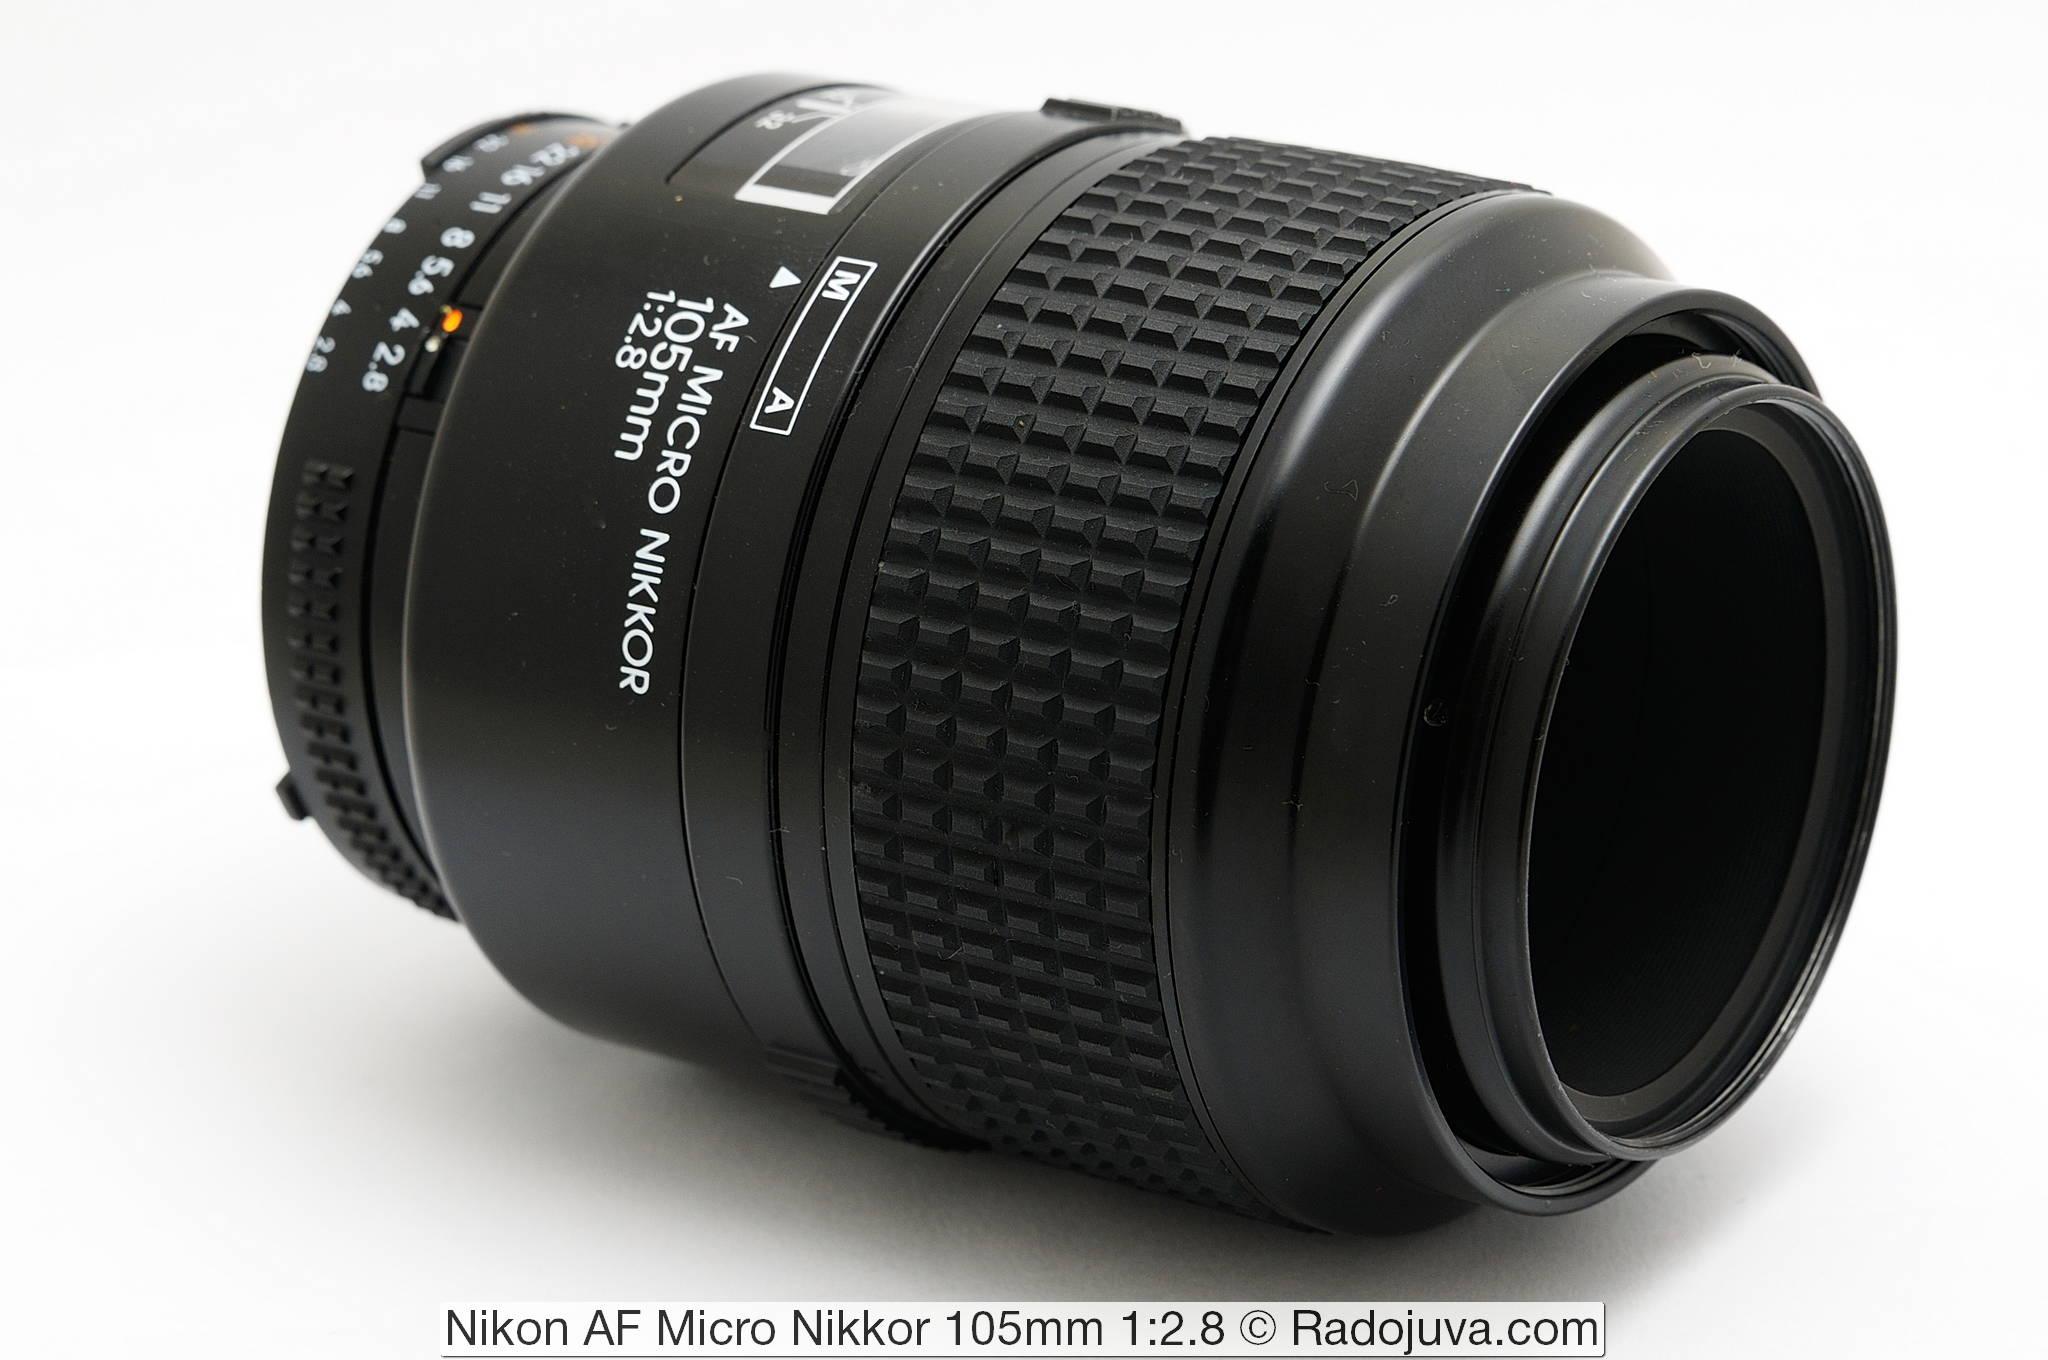 Nikon AF Micro Nikkor 105mm 1:2.8